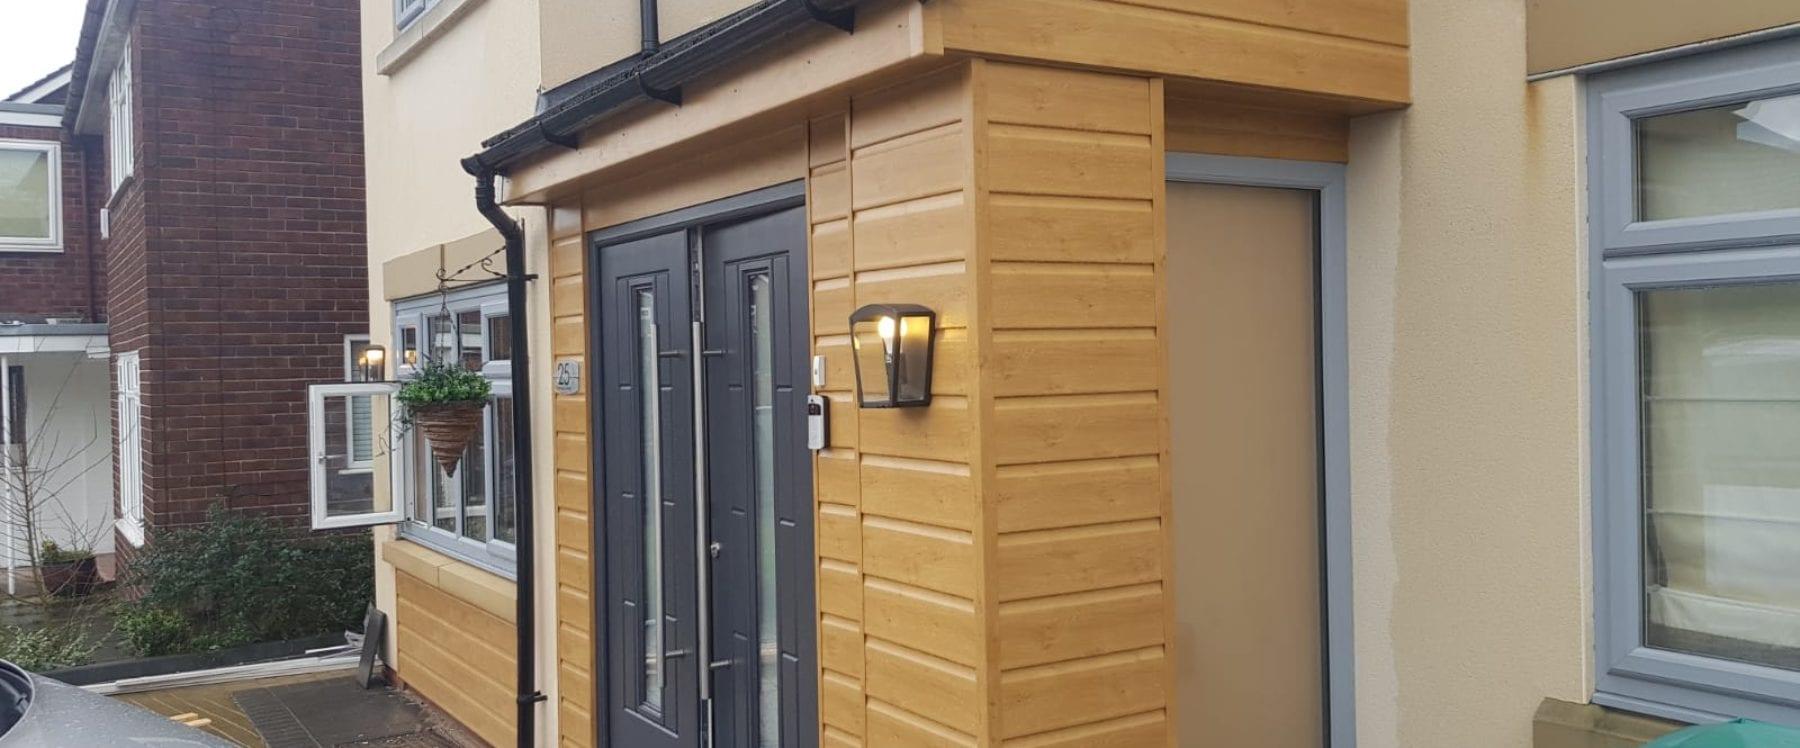 porch in liverpool